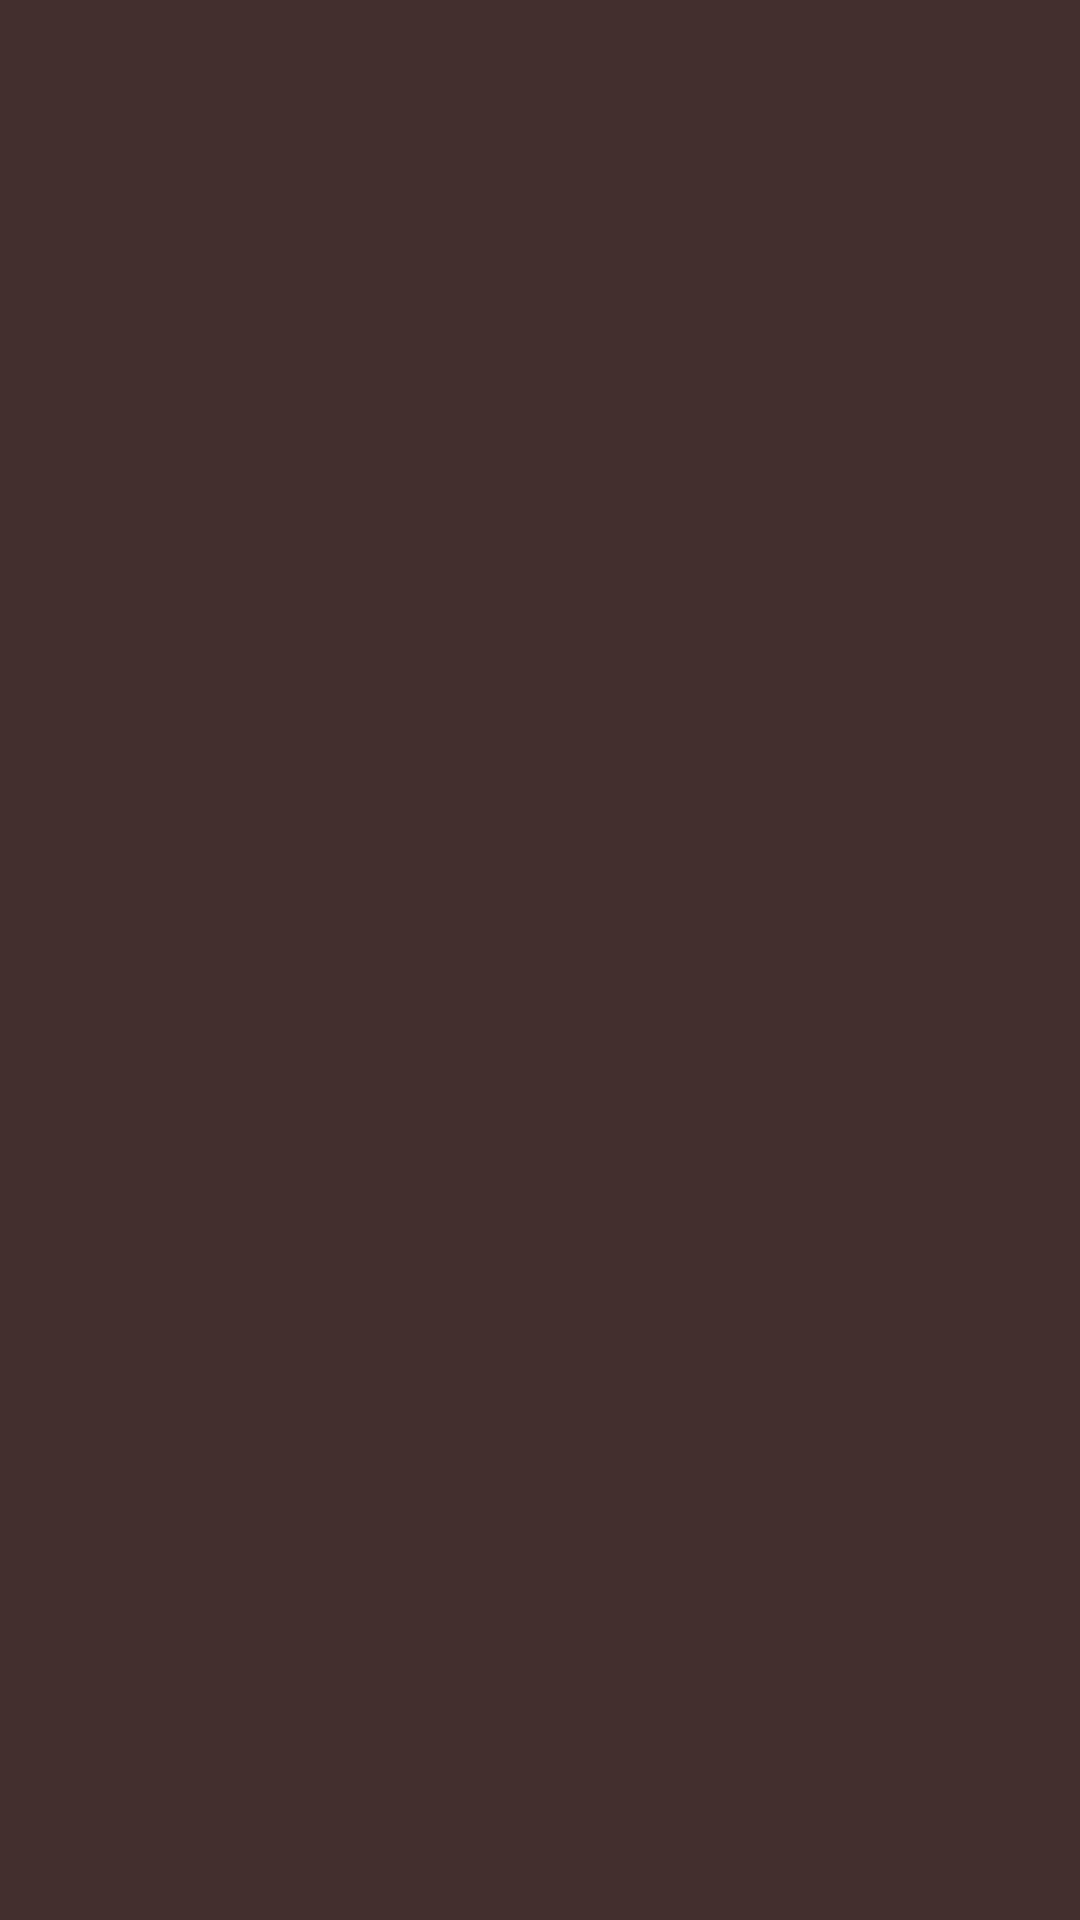 1080x1920 Old Burgundy Solid Color Background